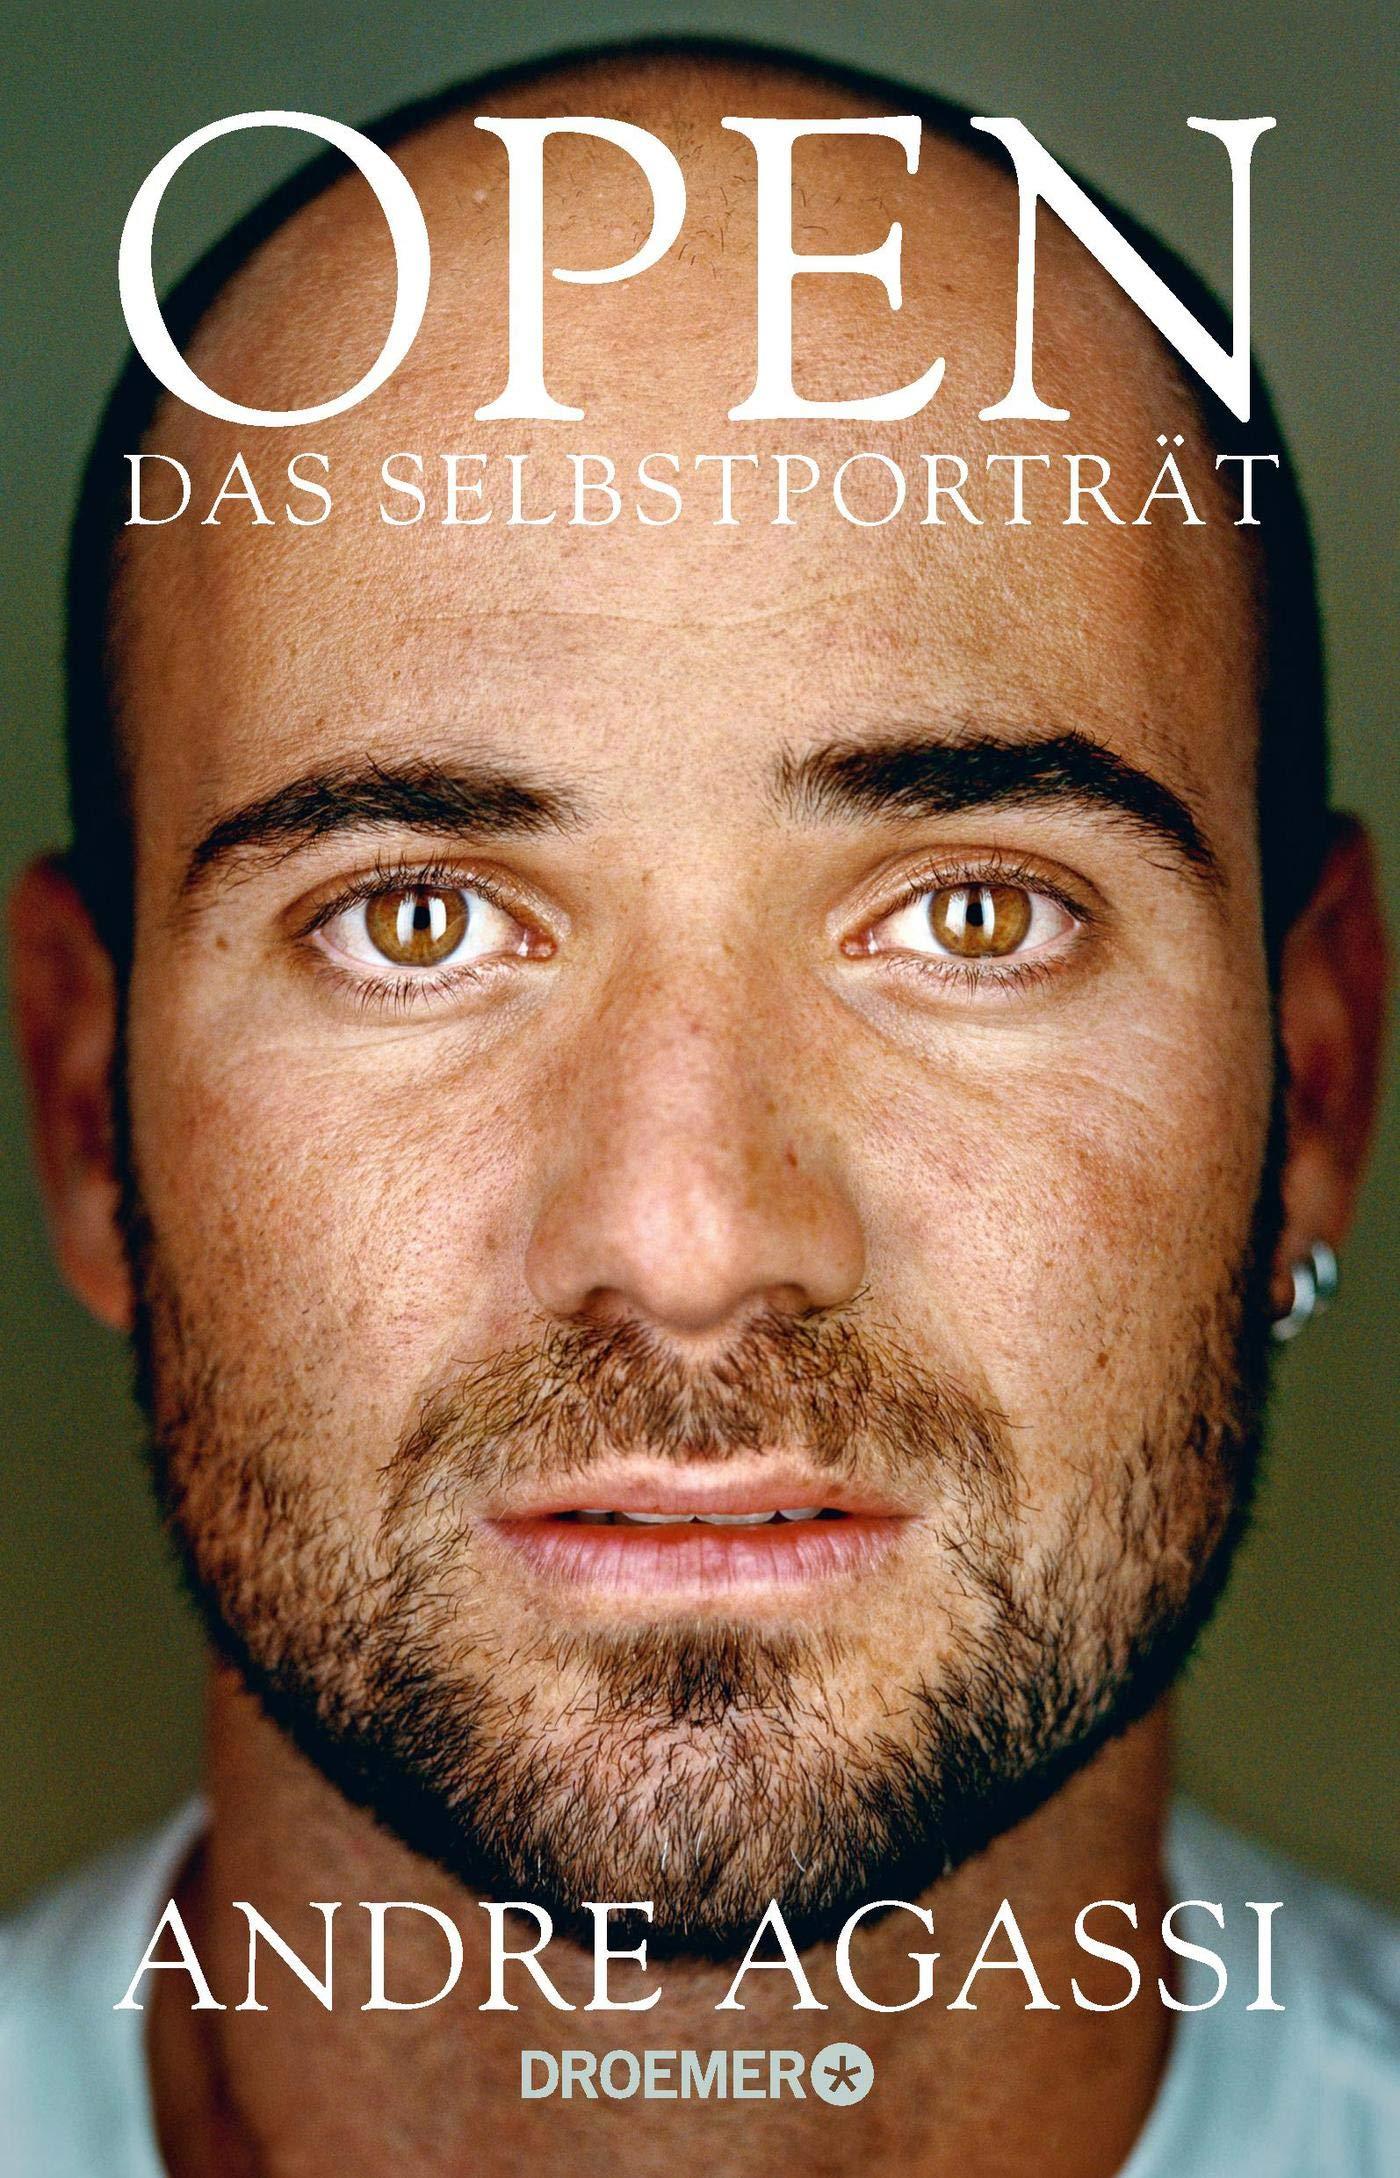 Open: Das Selbstportrt: Amazon.es: Agassi, Andre, Breuer, Charlotte, Mllemann, Norbert: Libros en idiomas extranjeros